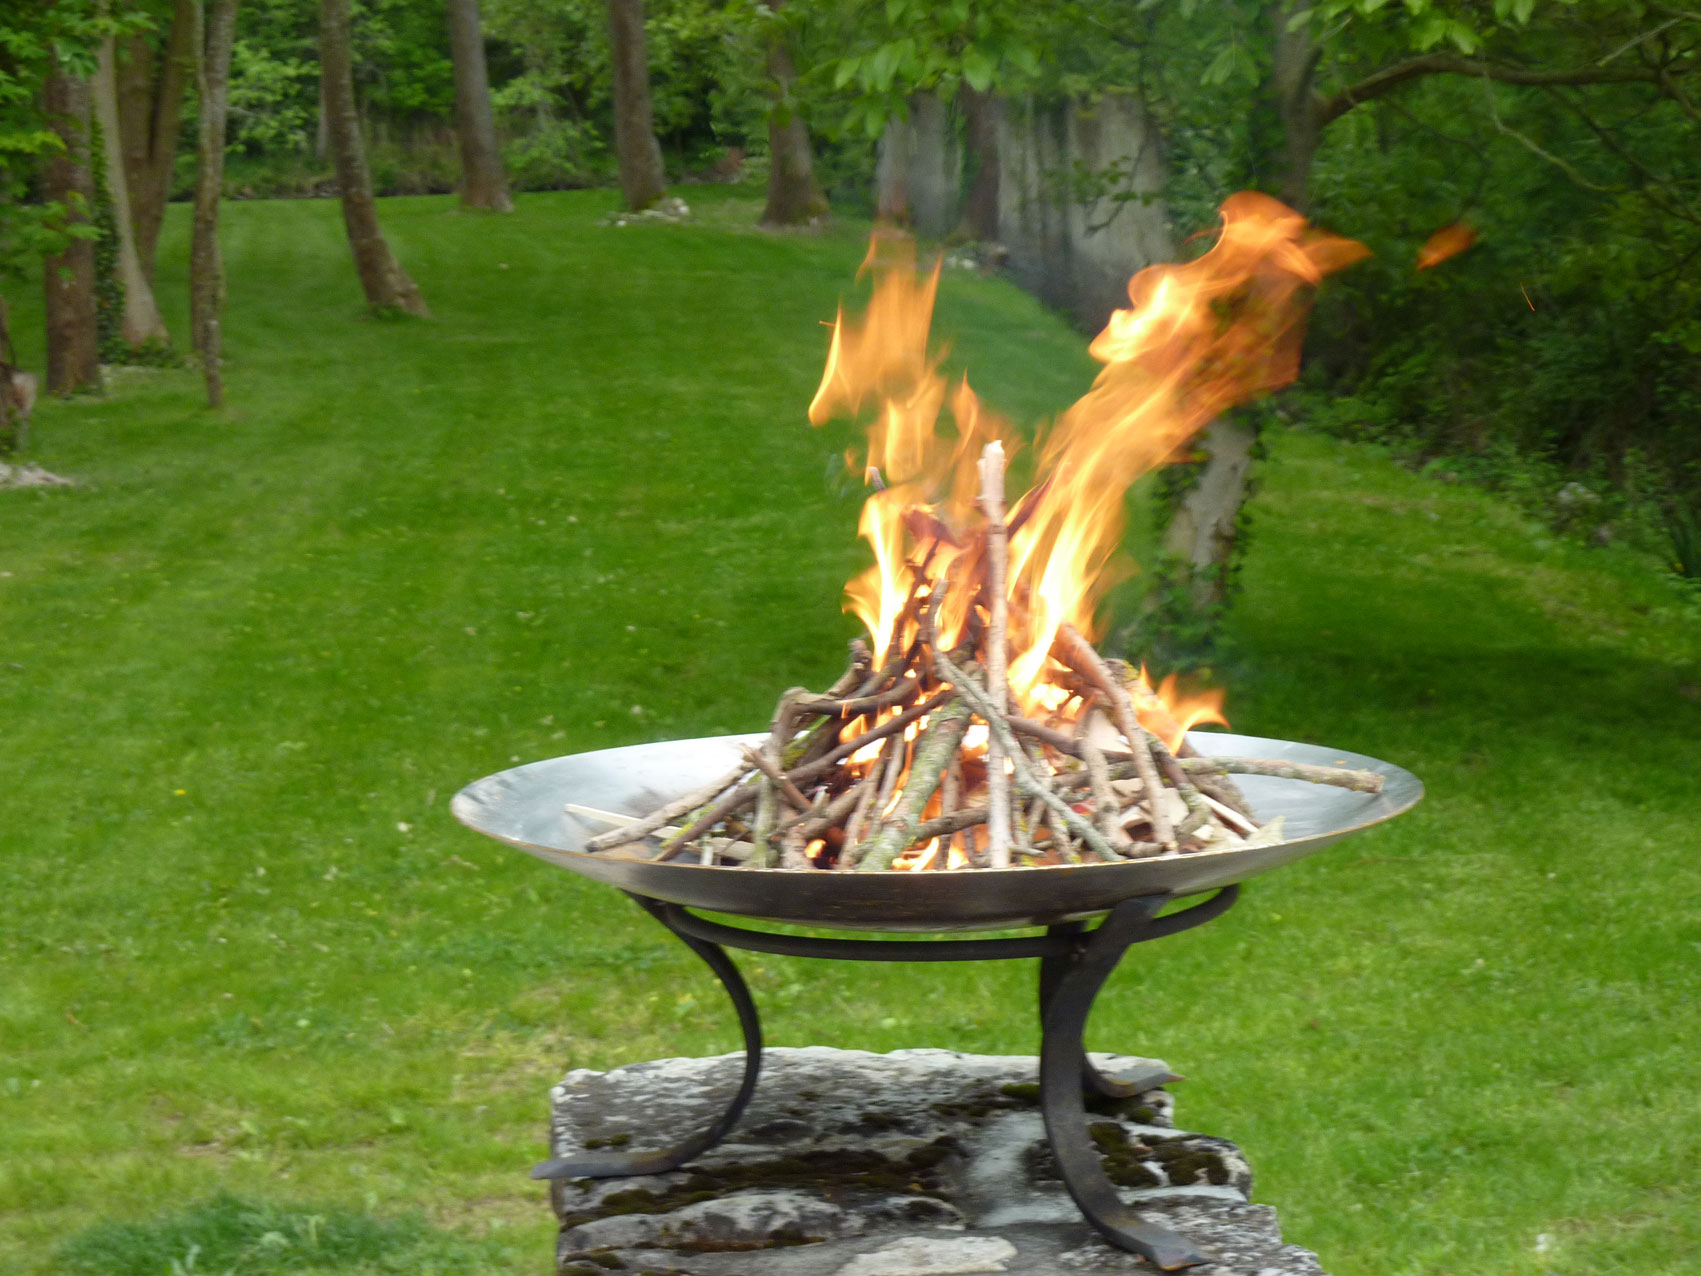 Fire Bowl Coupe Feu Lounge Brasero Dit Gai De Grez